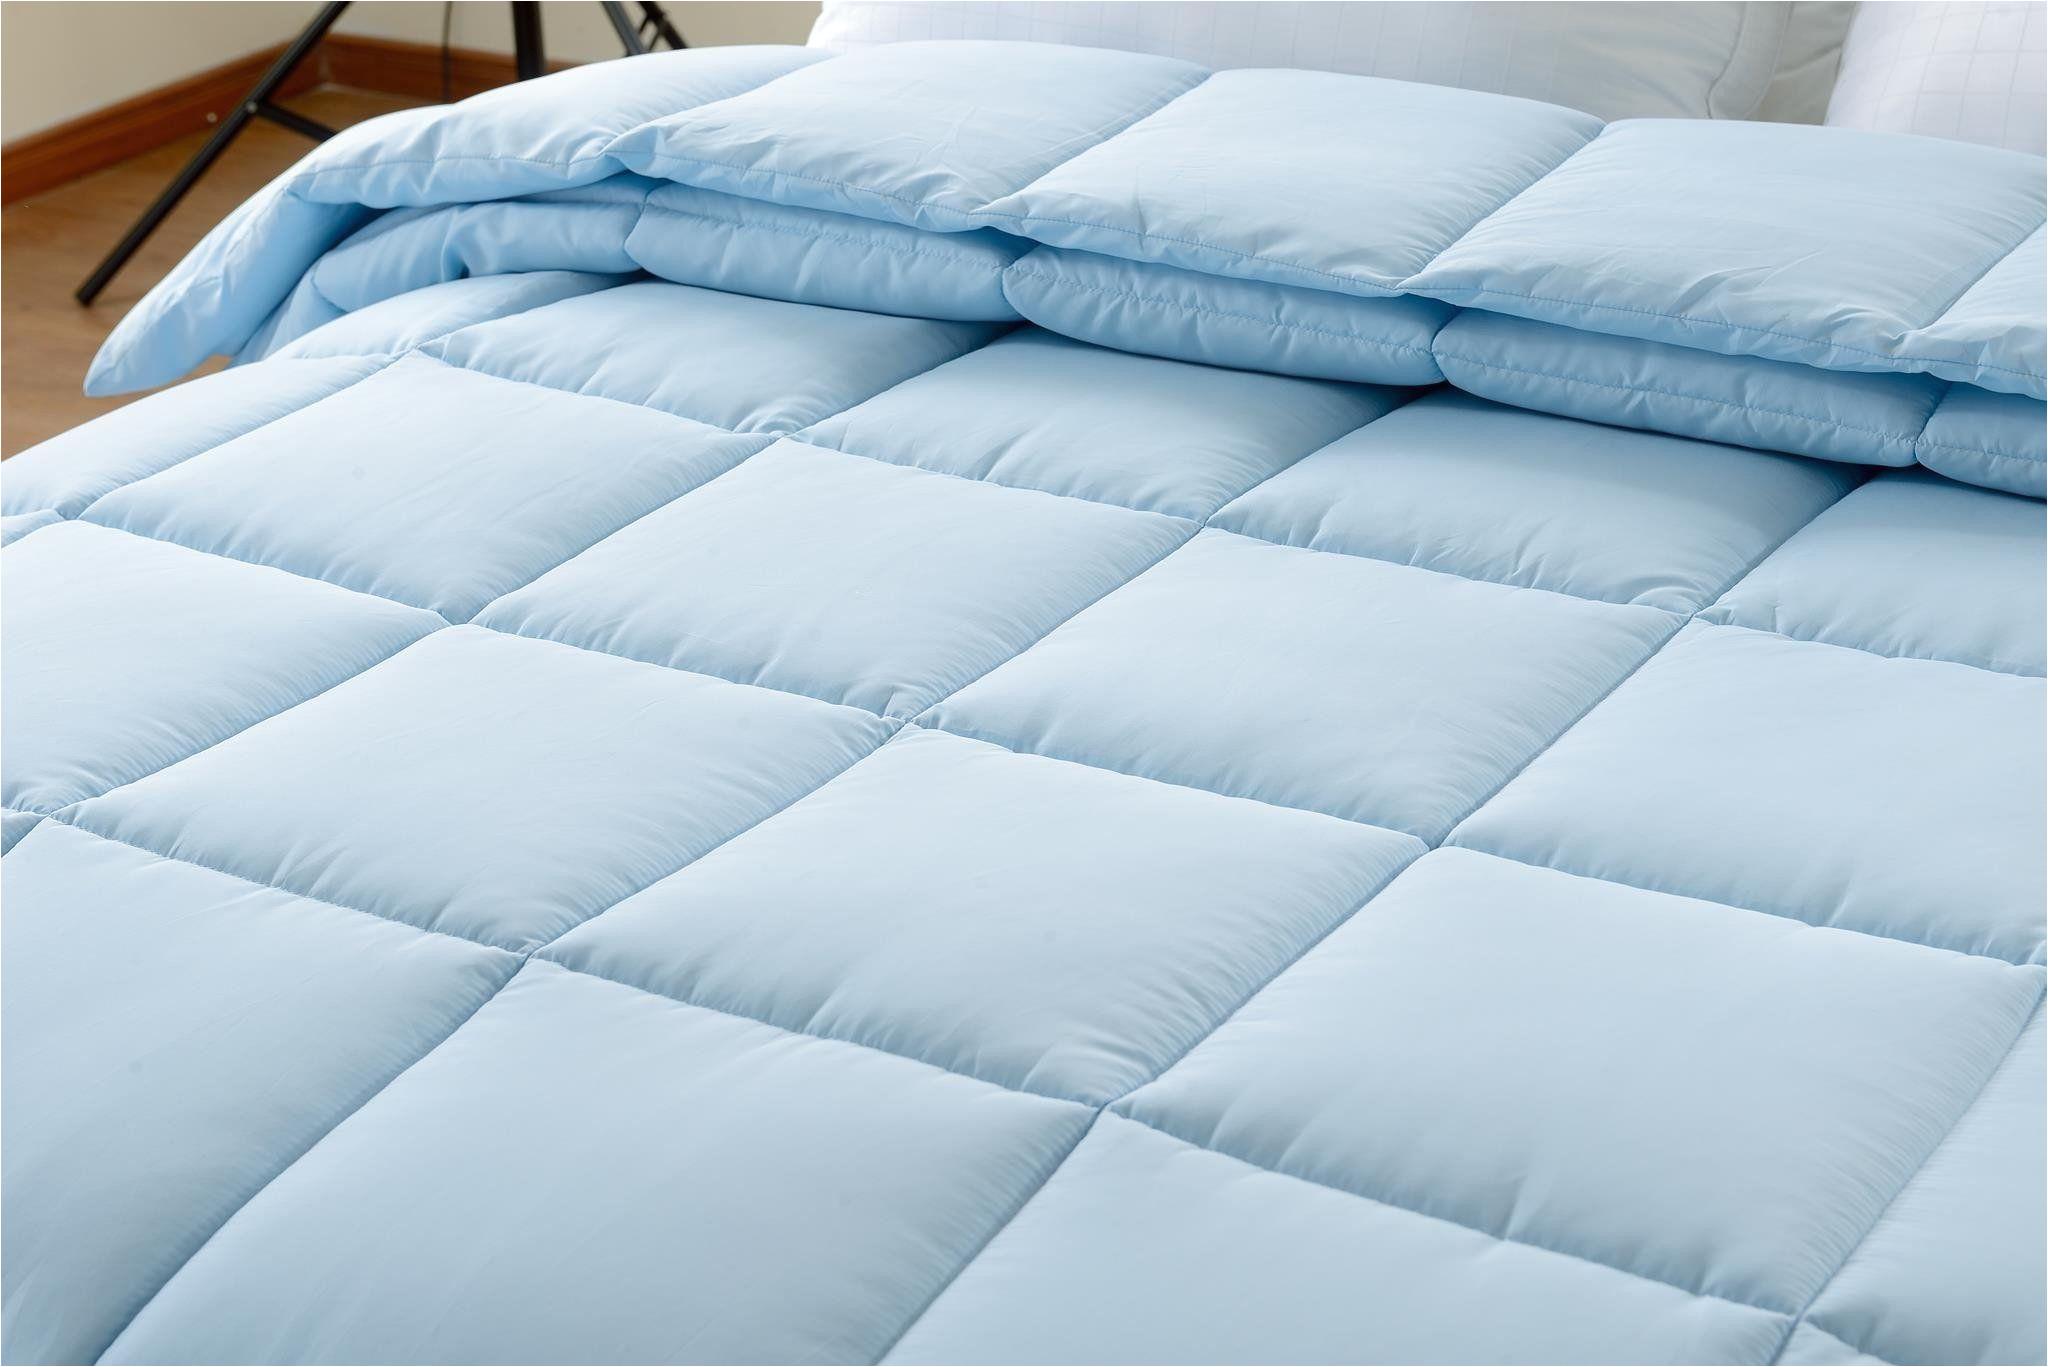 super oversized high quality down alternative comforter fits pillow top beds light